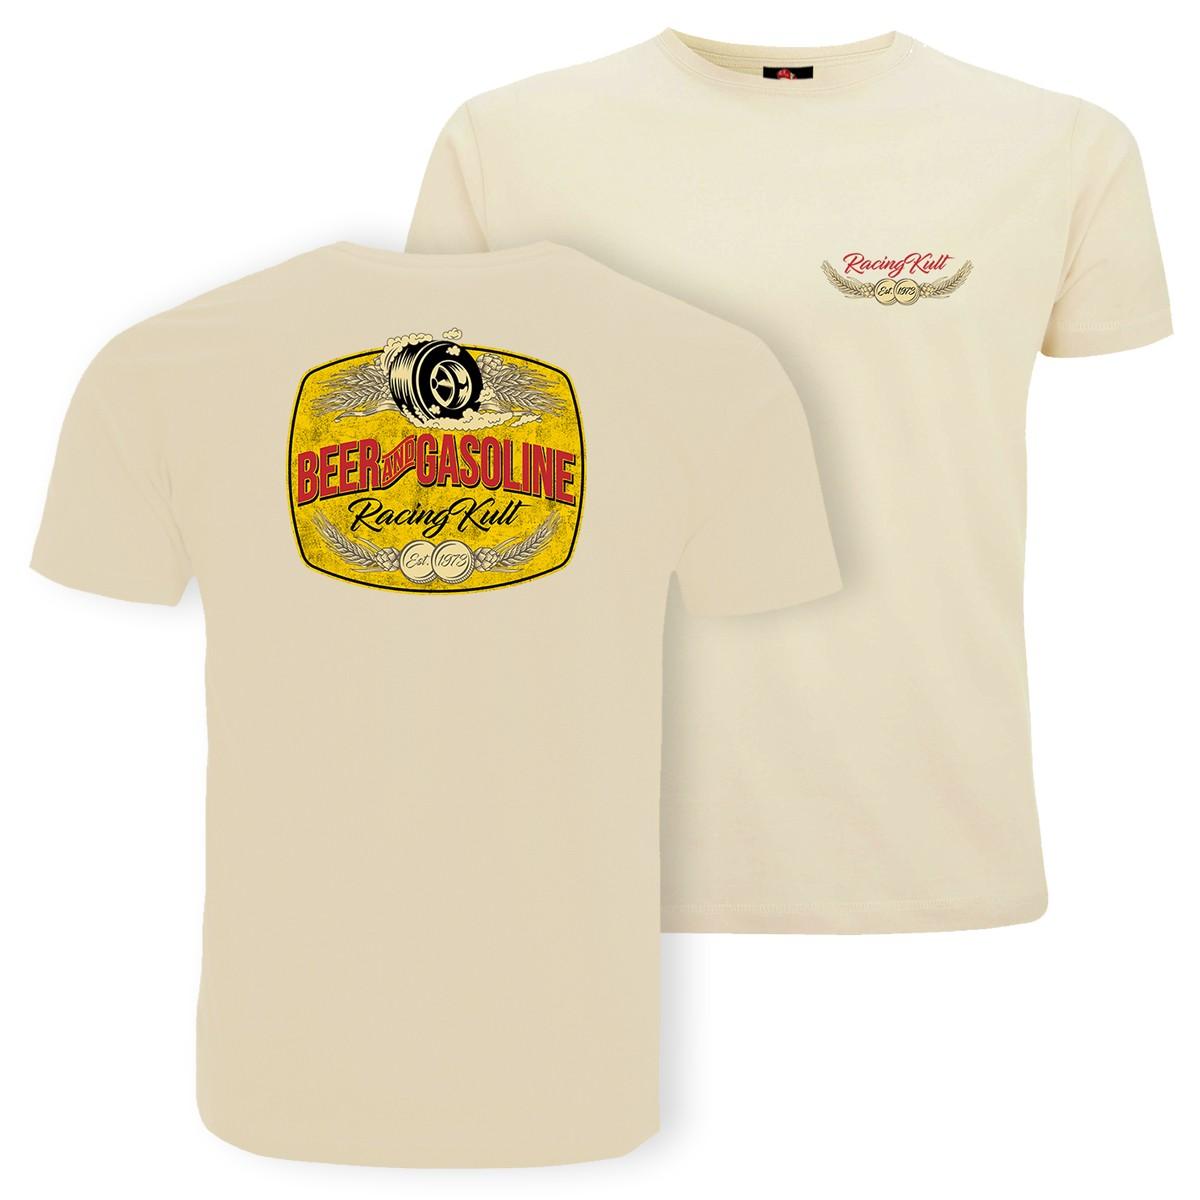 Racing Kult T-Shirt Beer and Gasoline